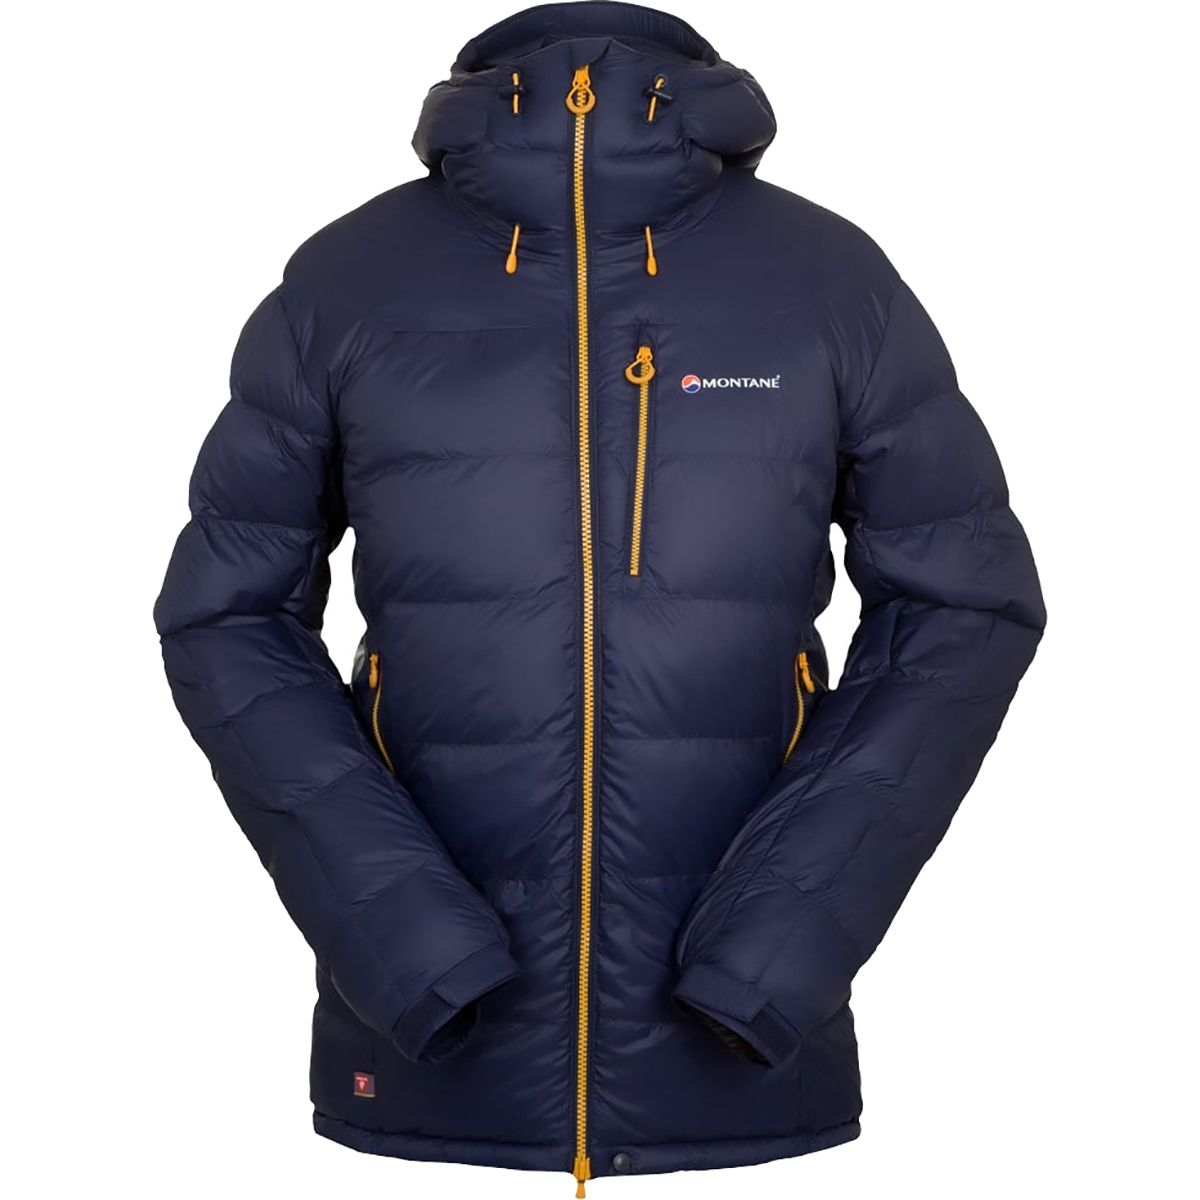 Montane Black Ice Jacket